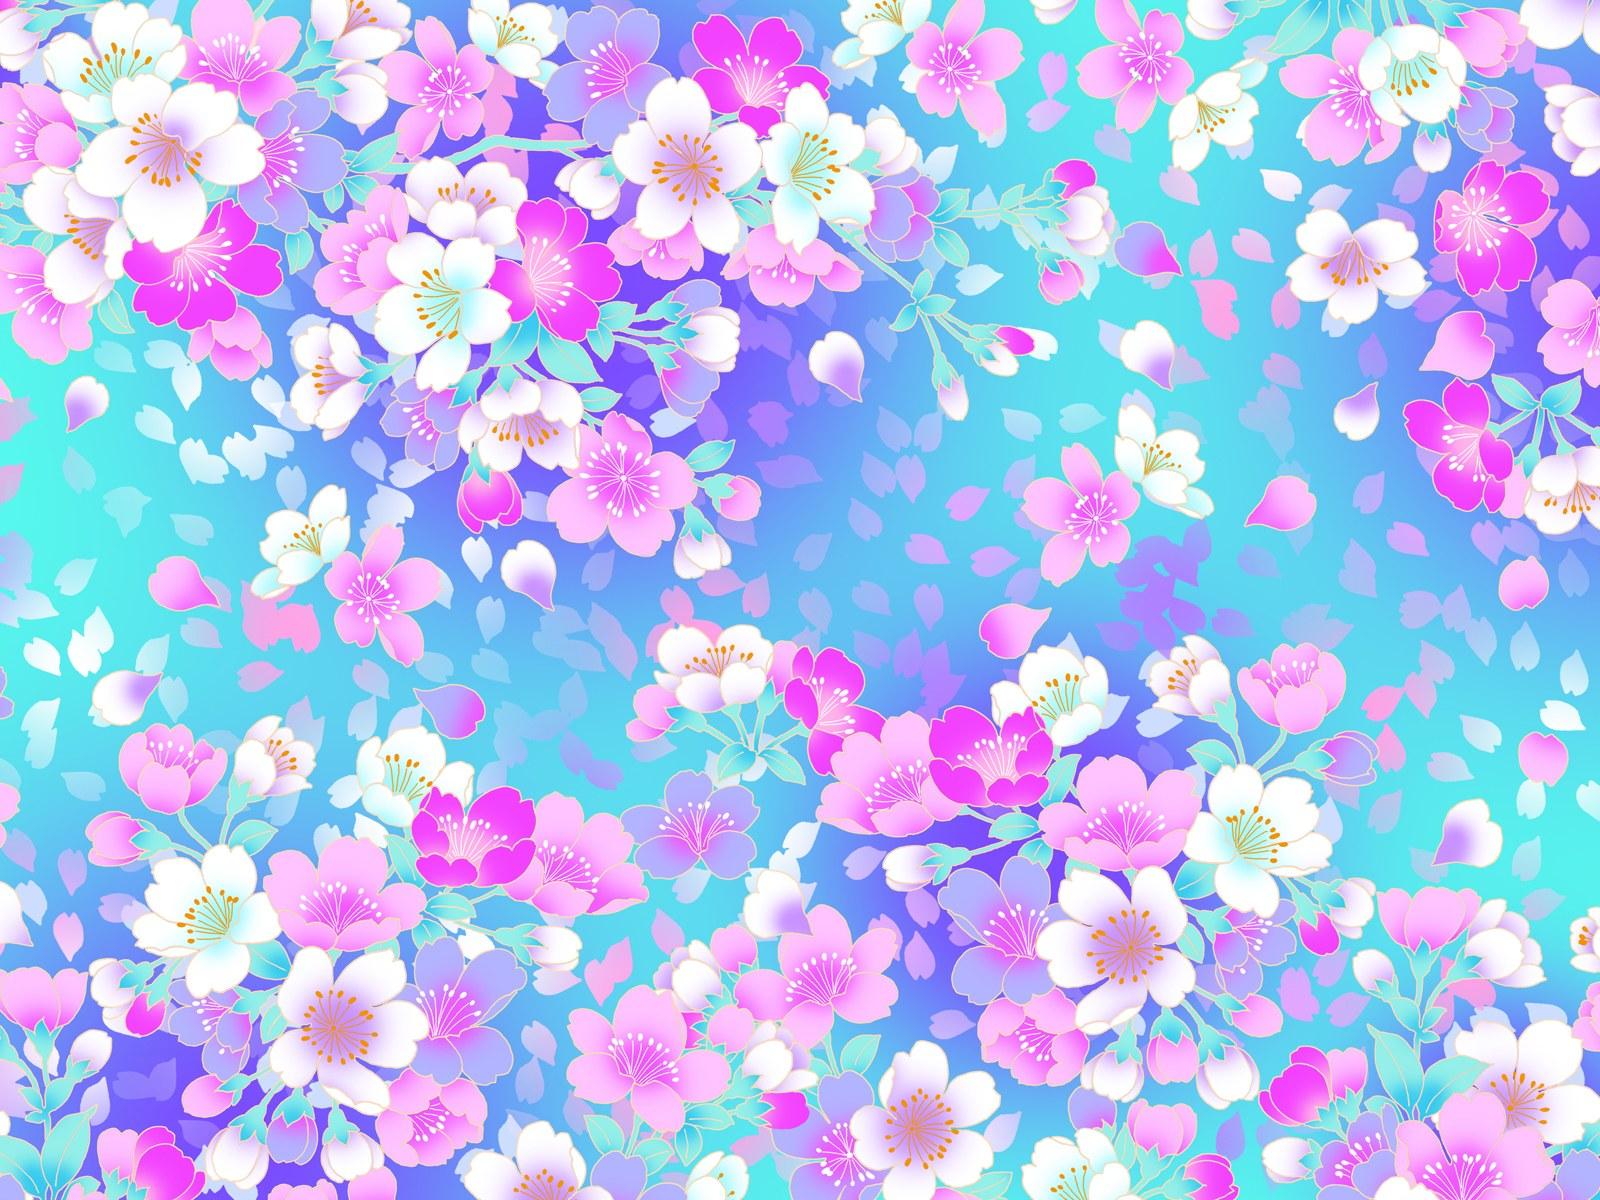 Flower Pattern Wallpaper Px Hdwallsource